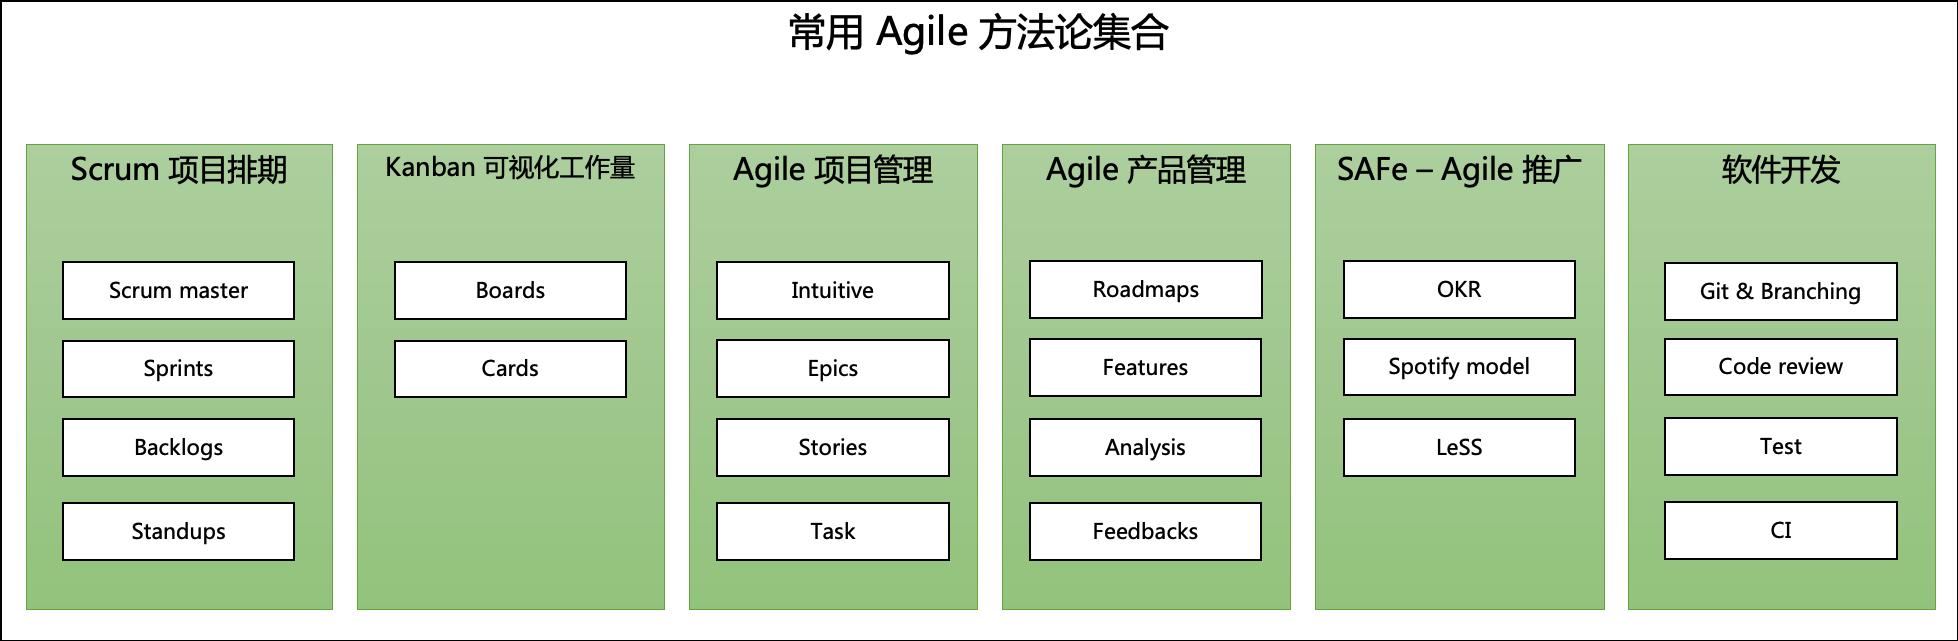 agile-methodology-set.png